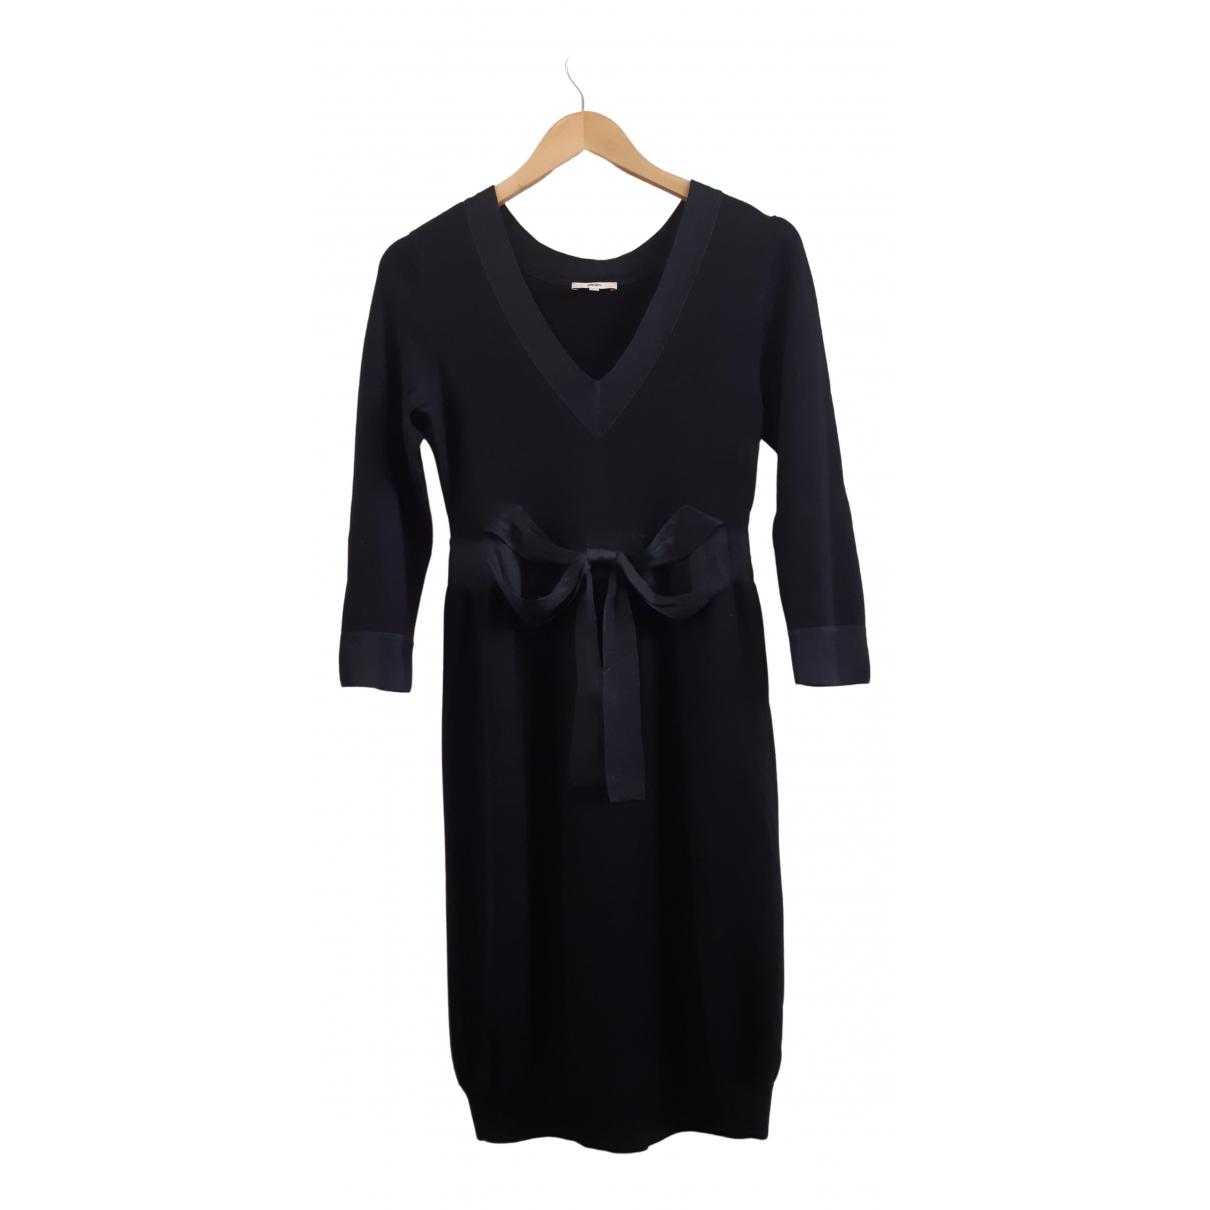 Kenzo N Black Wool dress for Women M International